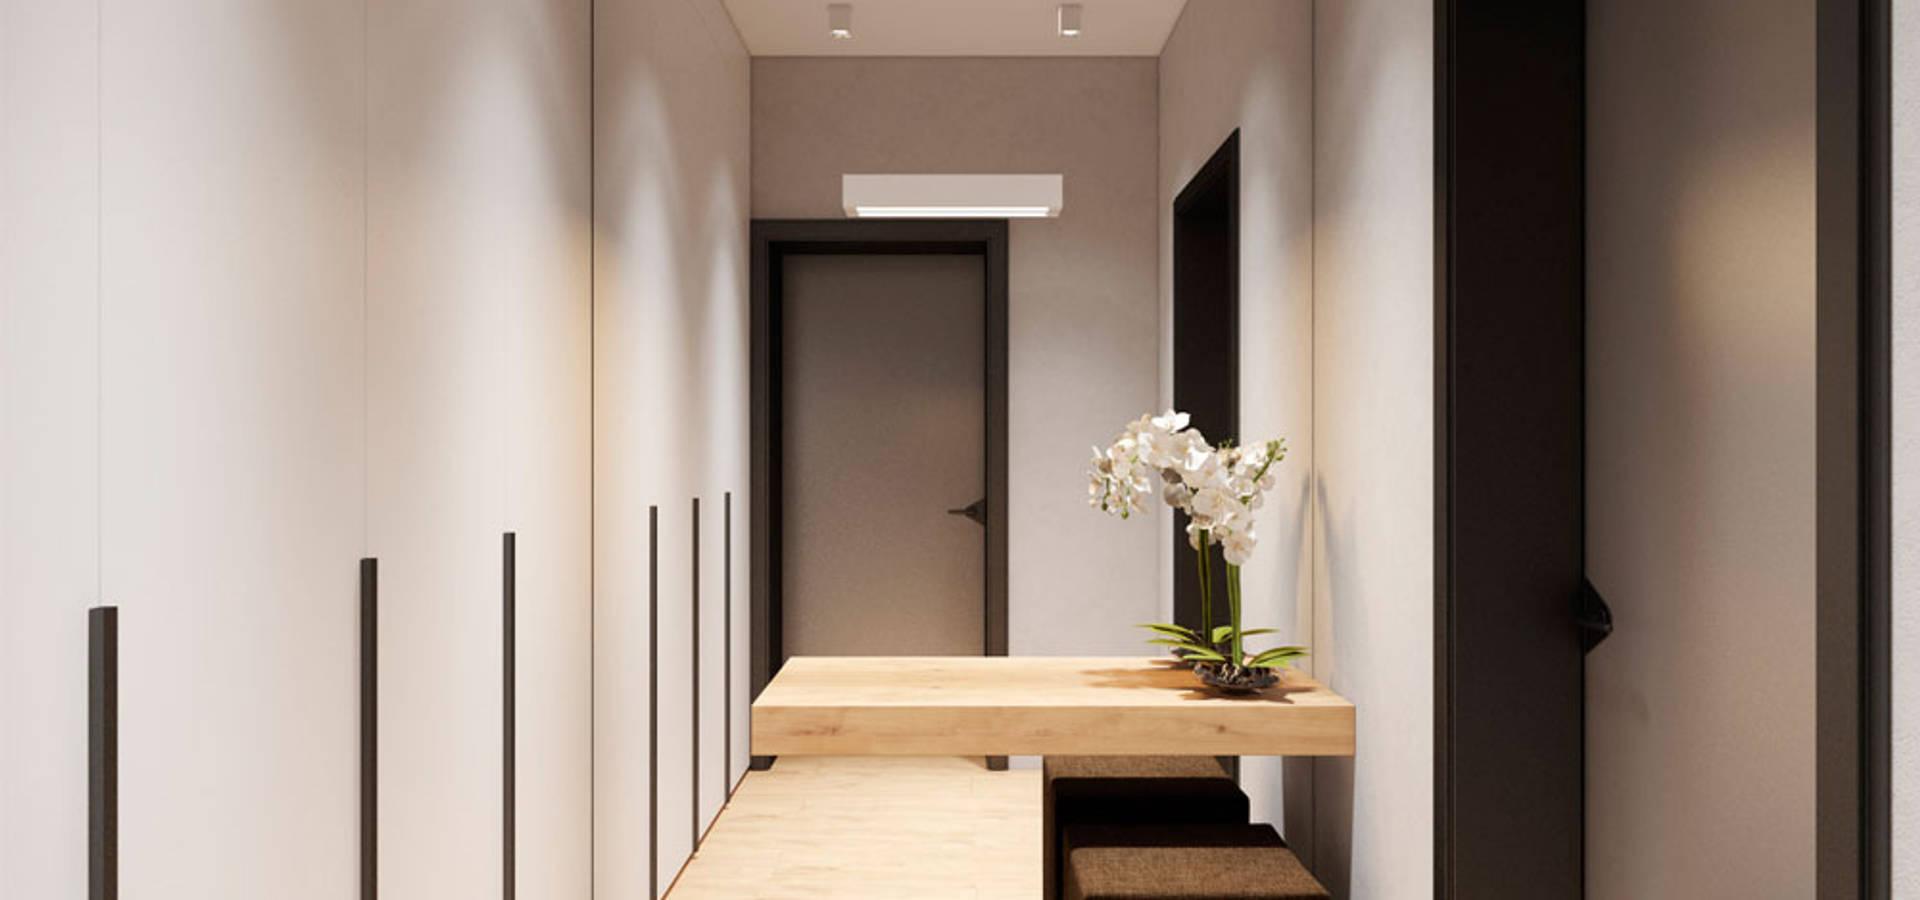 ART Studio Design & Construction